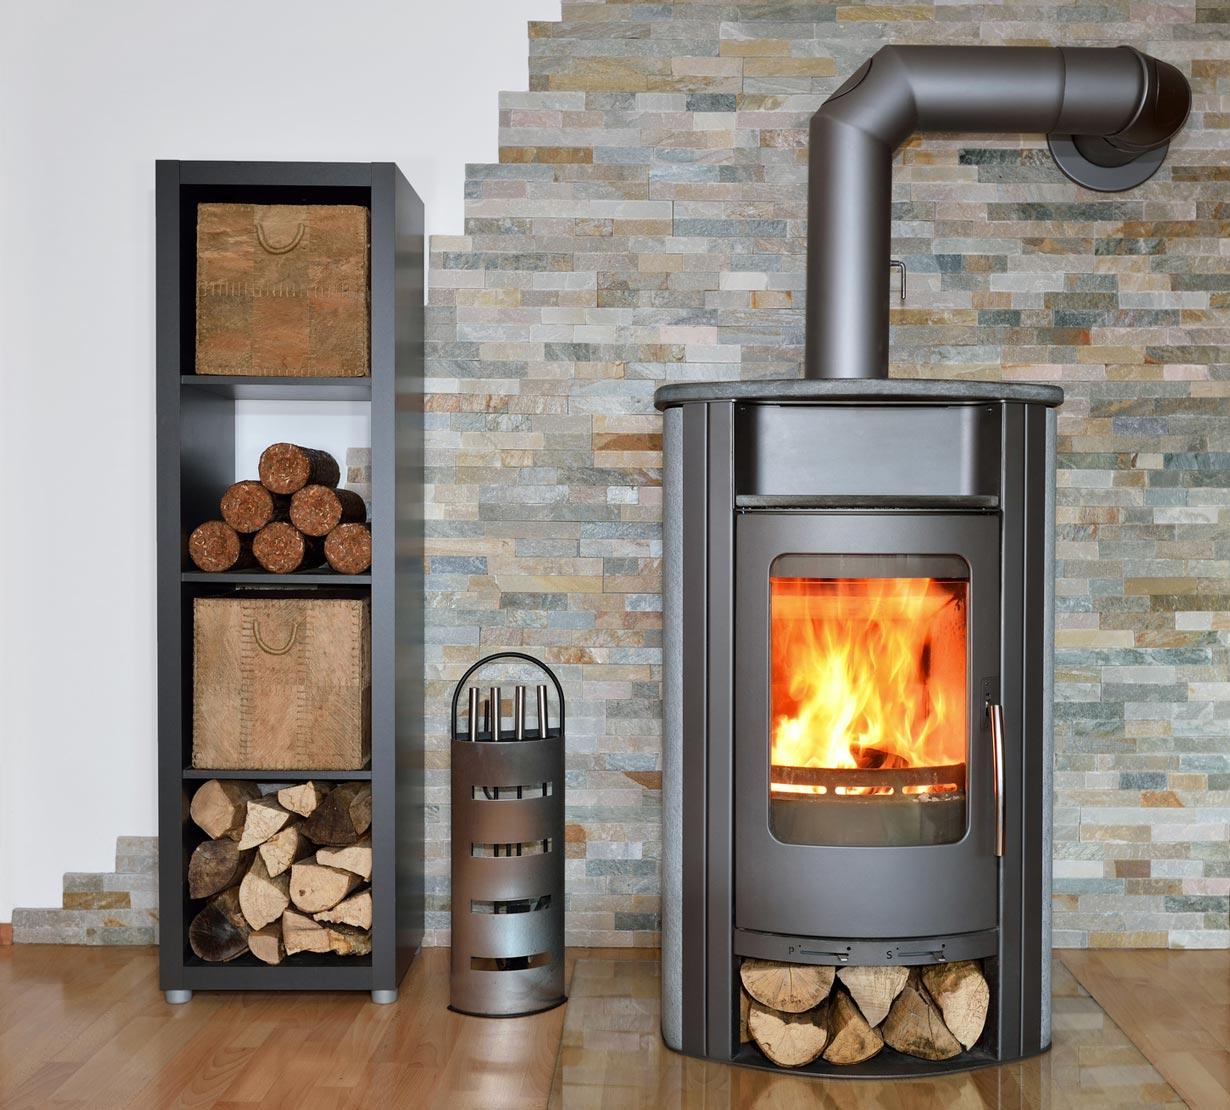 Brennholz richtig lagern ⋆ hausidee.de